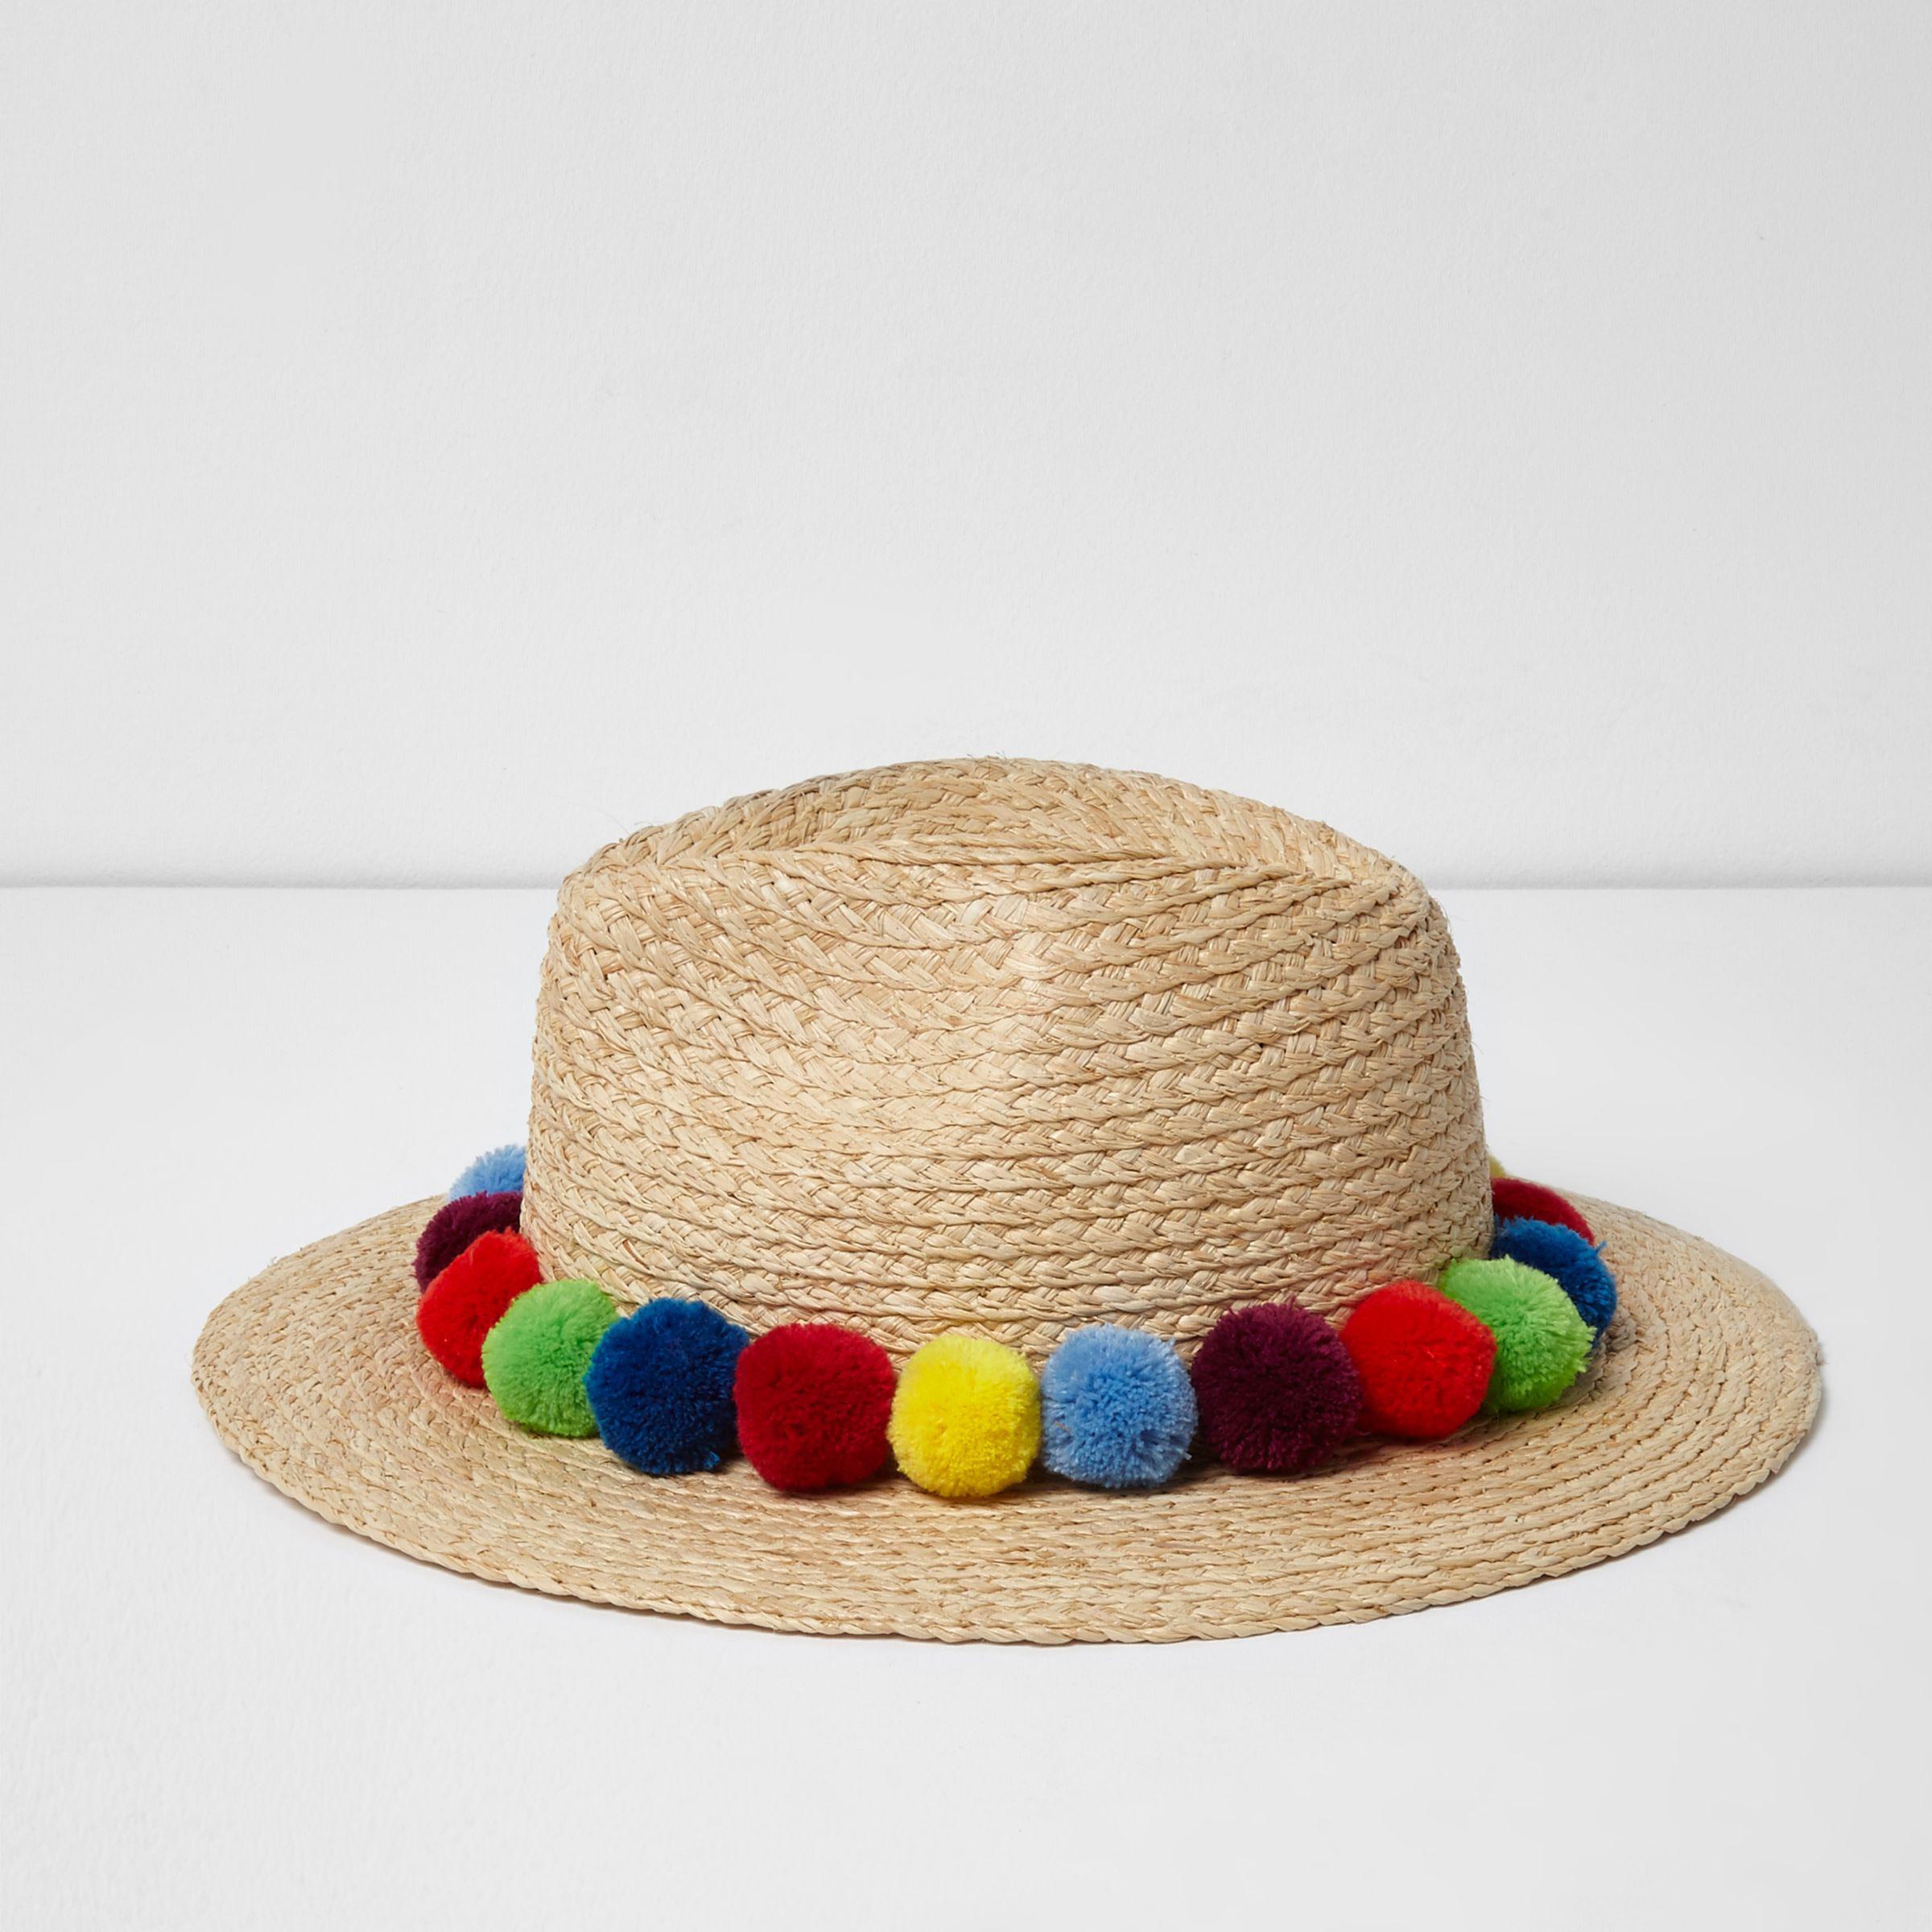 c2cf1aa572e Lyst - River Island Beige Pom Pom Trim Straw Fedora Hat in Natural